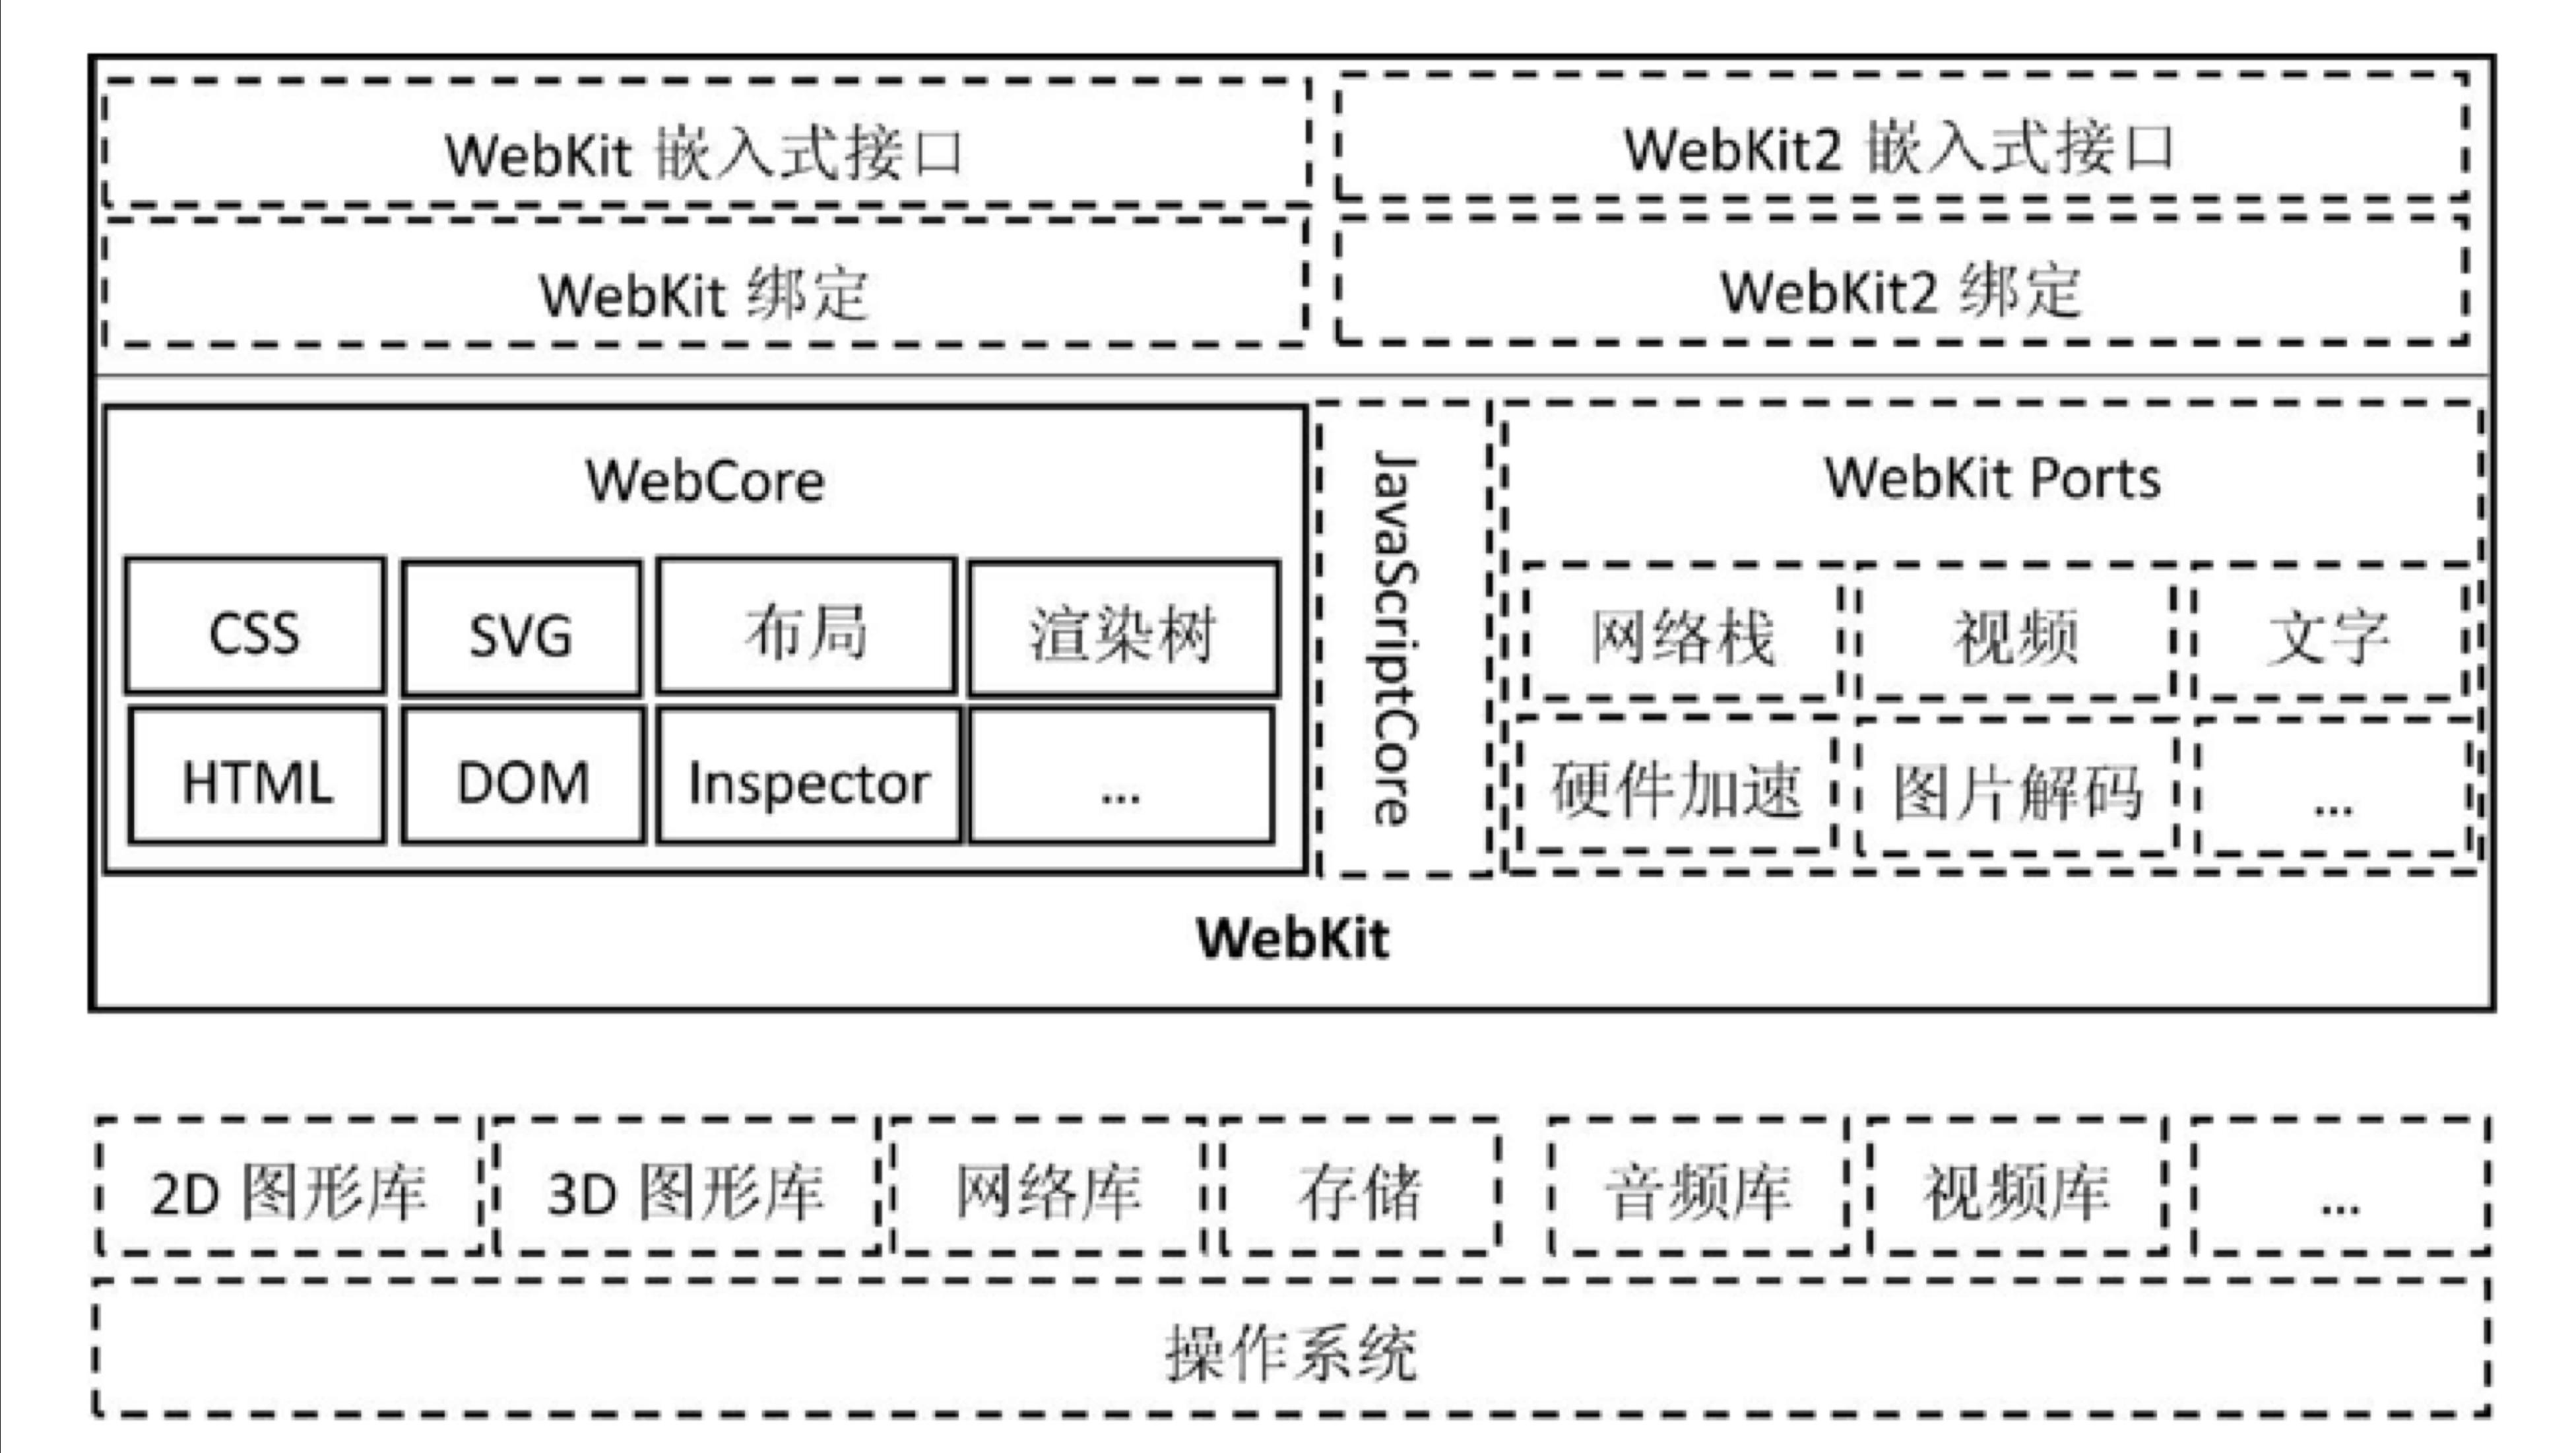 webkit2